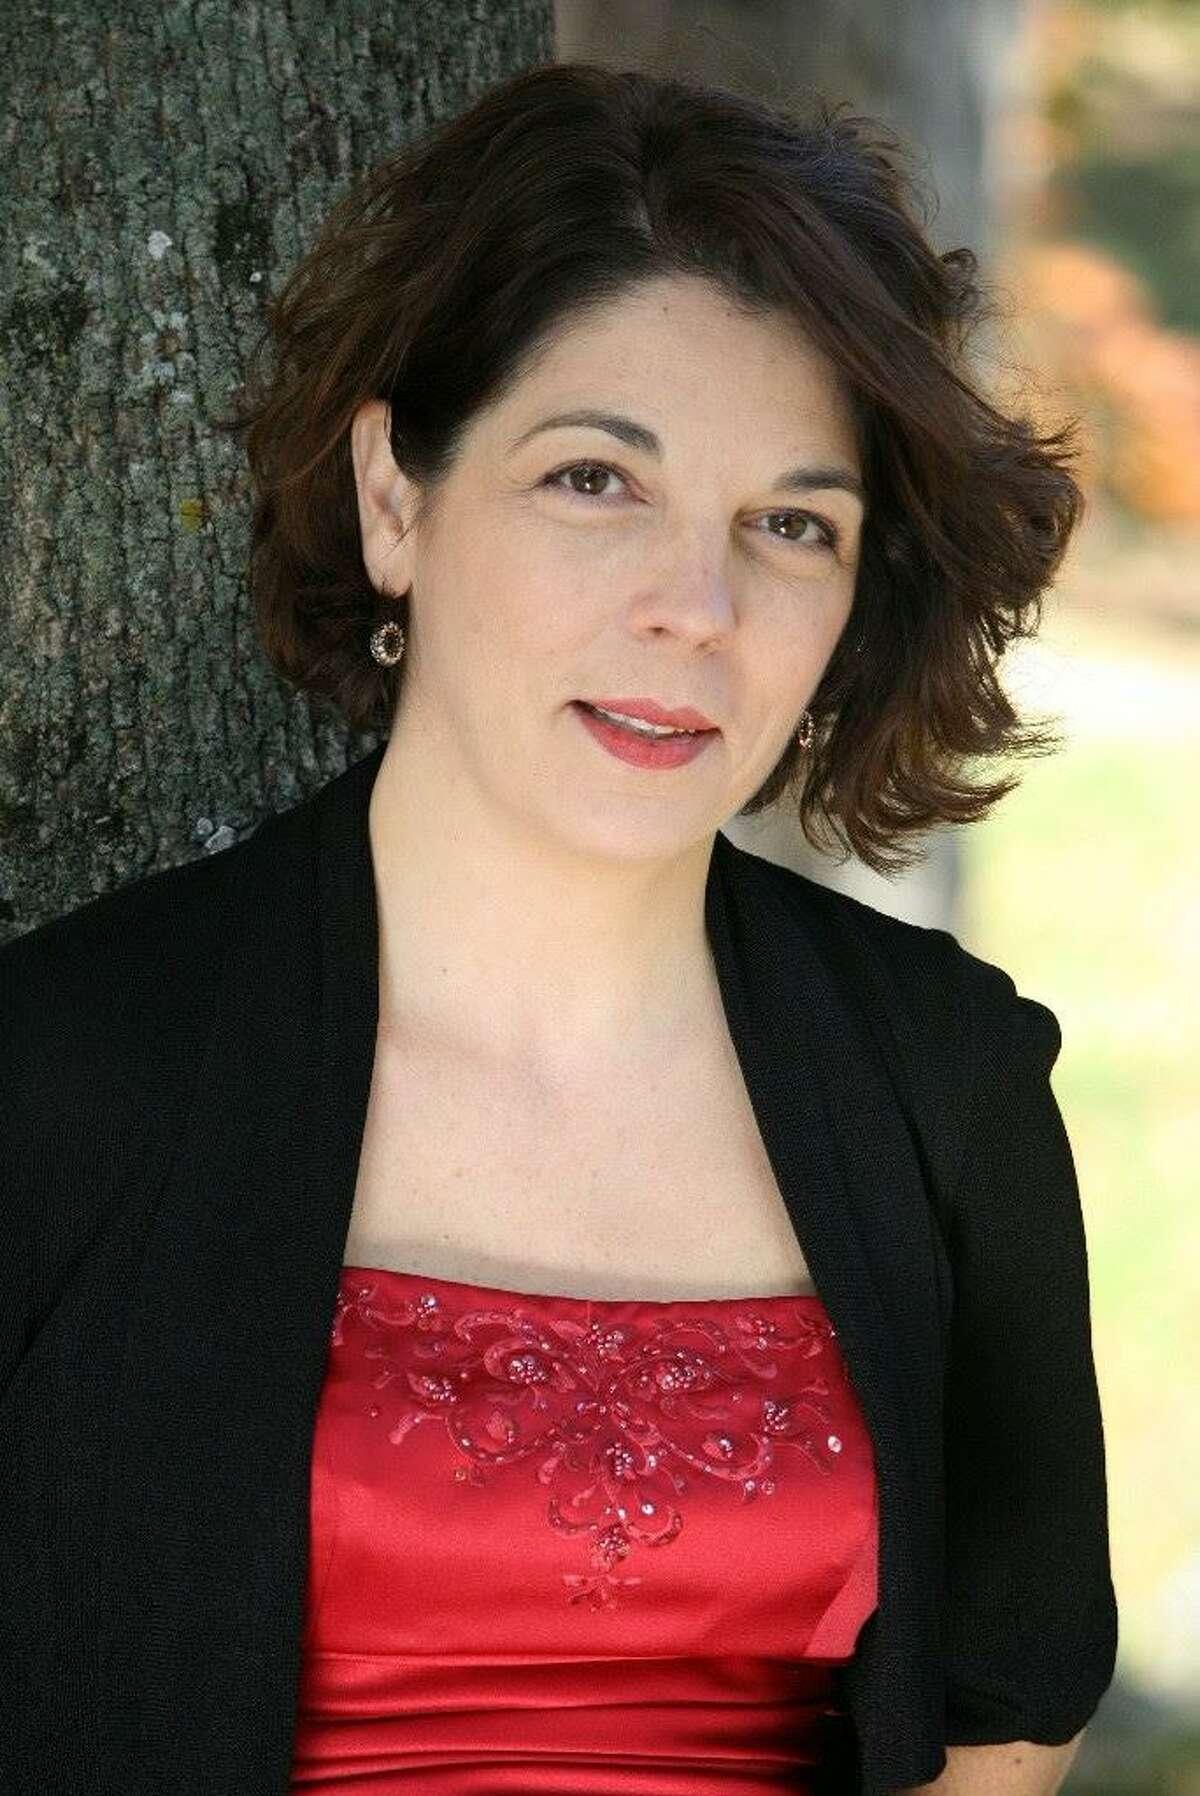 Soprano Louise Fauteux